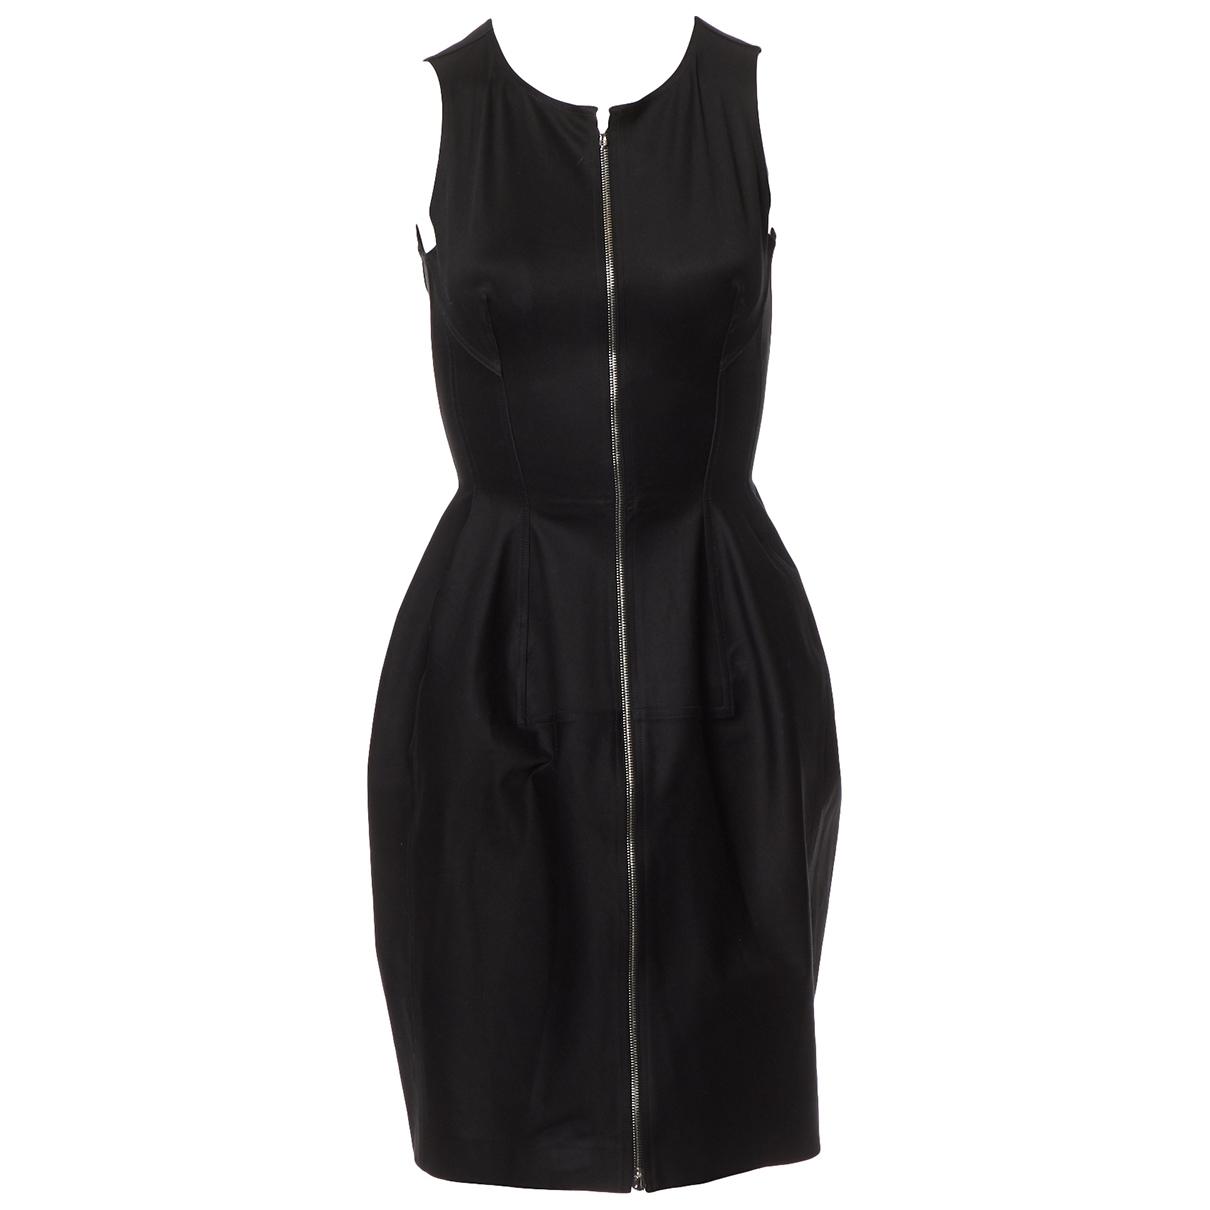 Alaia \N Kleid in  Schwarz Baumwolle